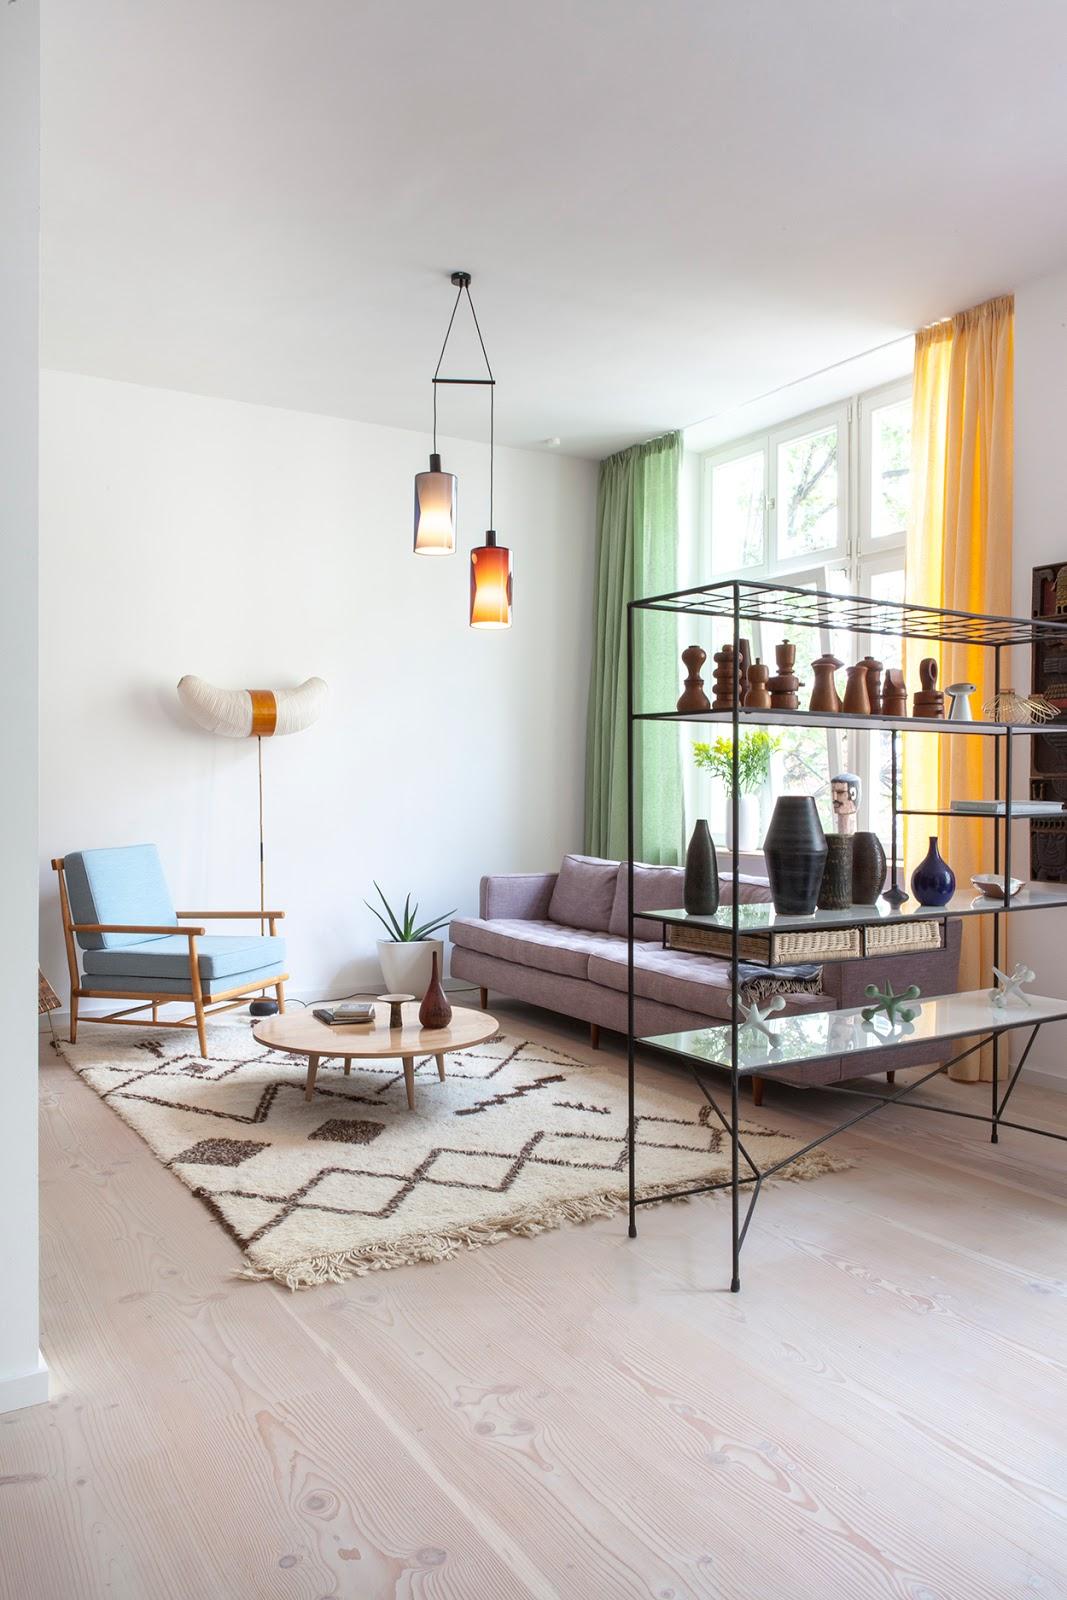 design attractor: Wonderful mid century design loft in Berlin